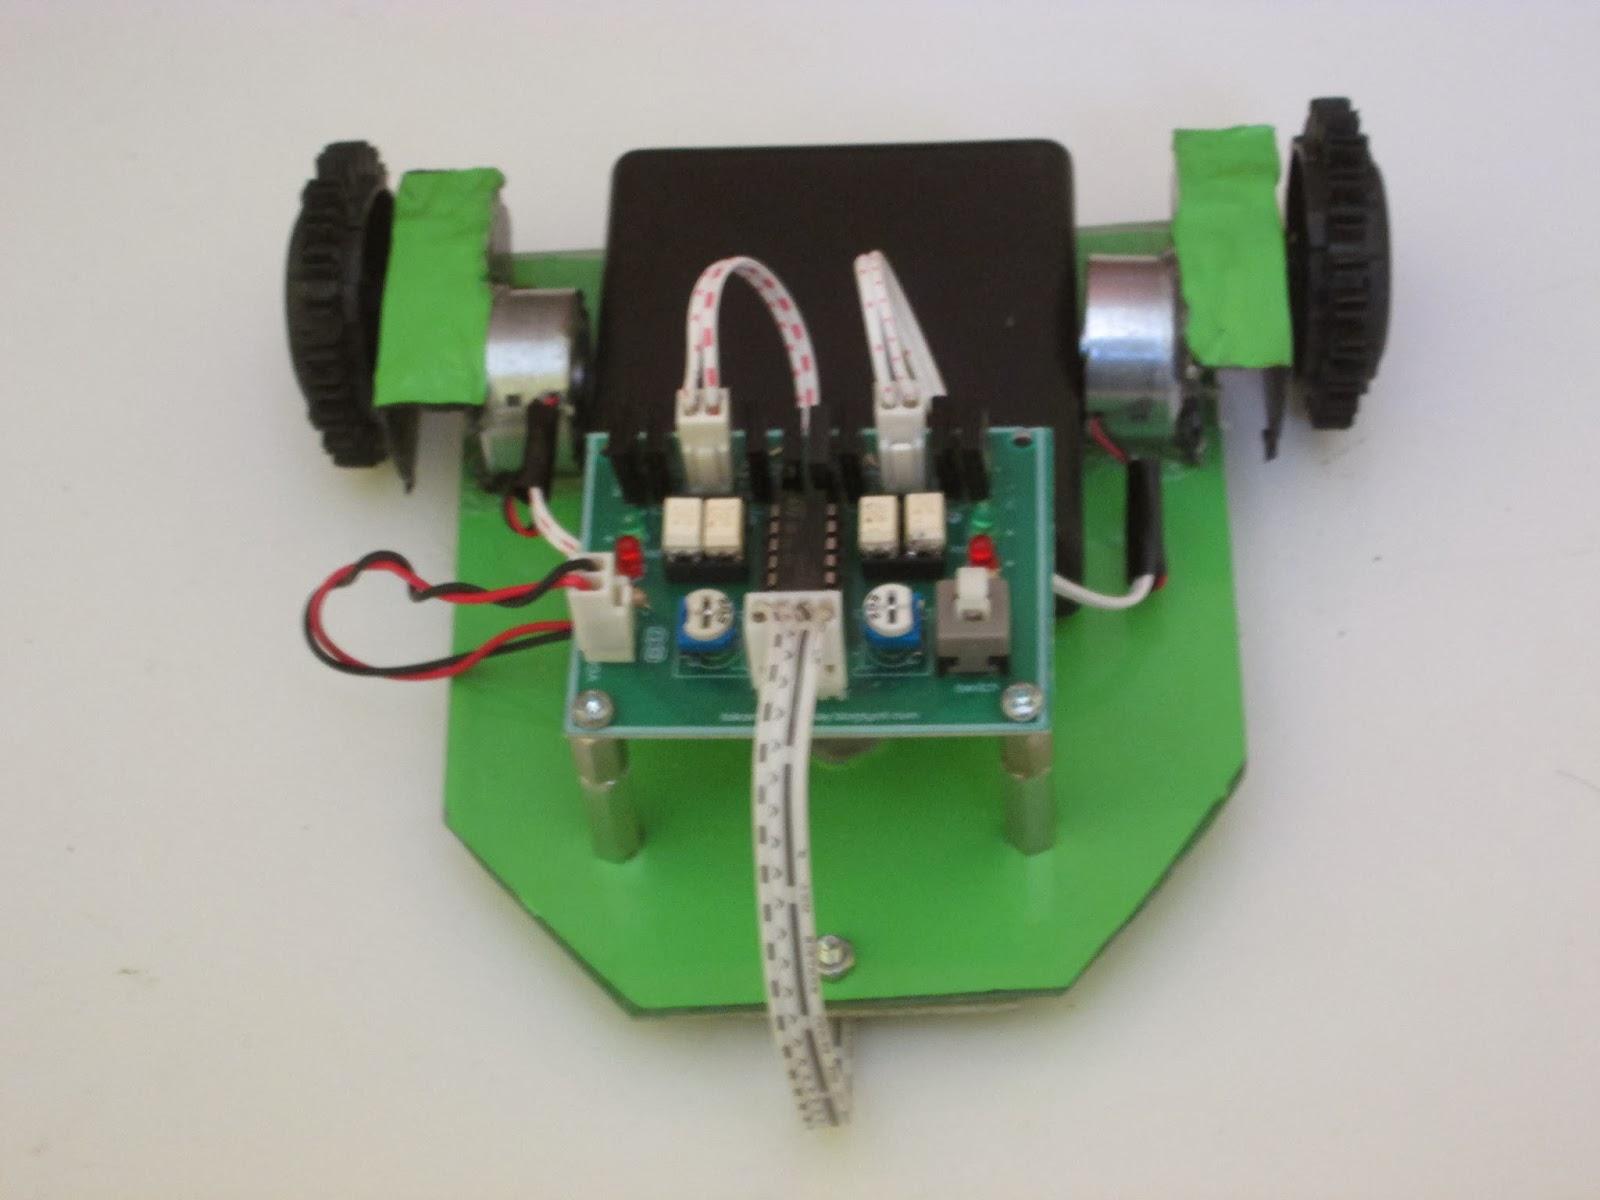 Robot line follower, robot line tracer. Robot Edukasi, Robot analog sederhana, http://toko-robot.blogspot.com/